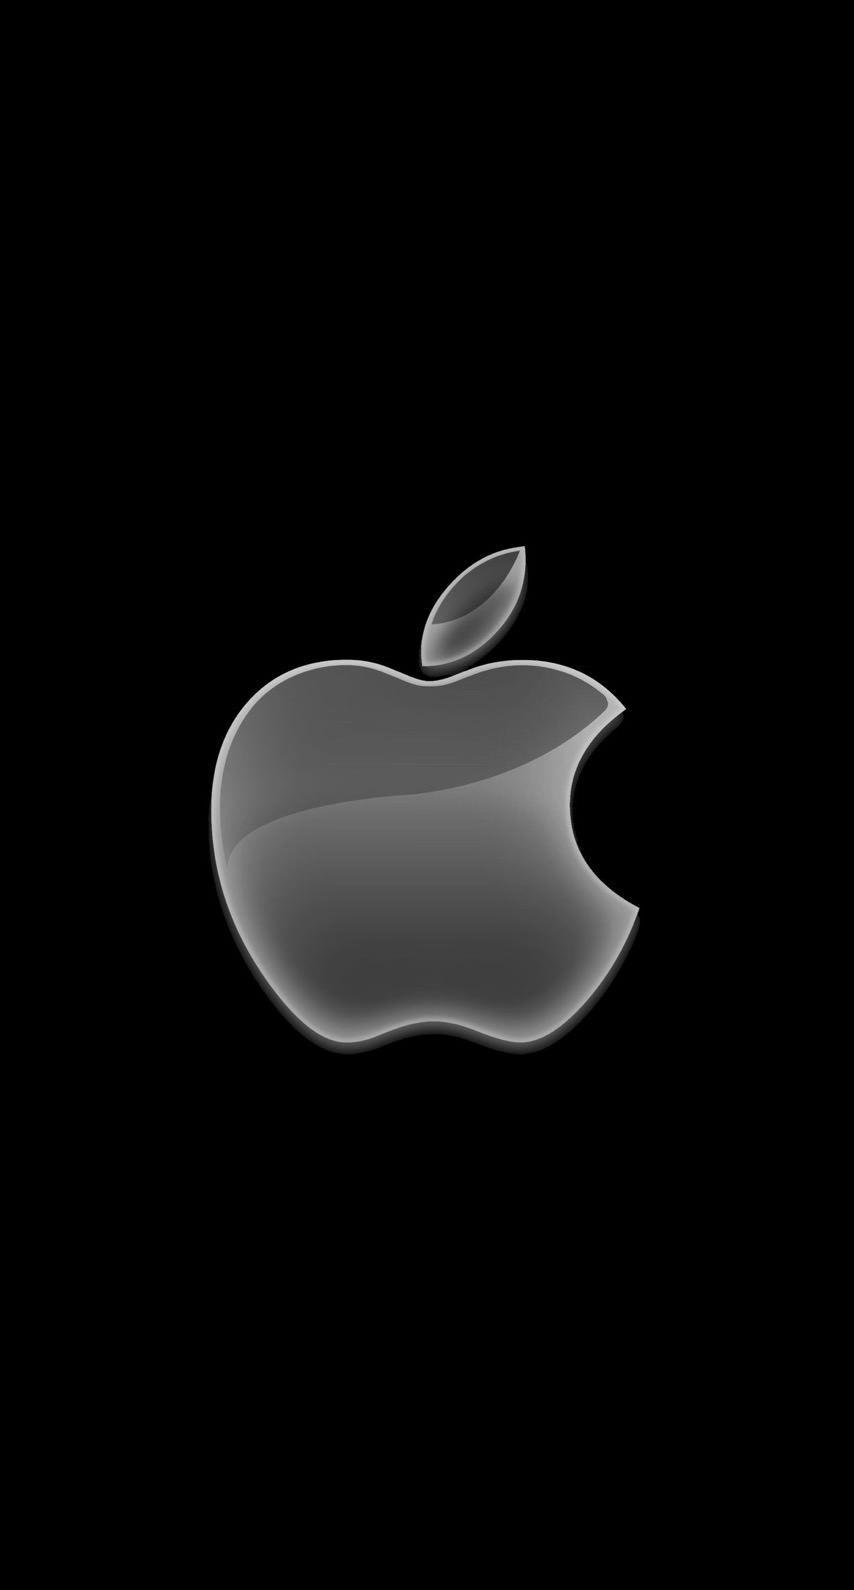 Apple Logo Black Cool Wallpaper Sc Iphone6s Apple Wallpaper